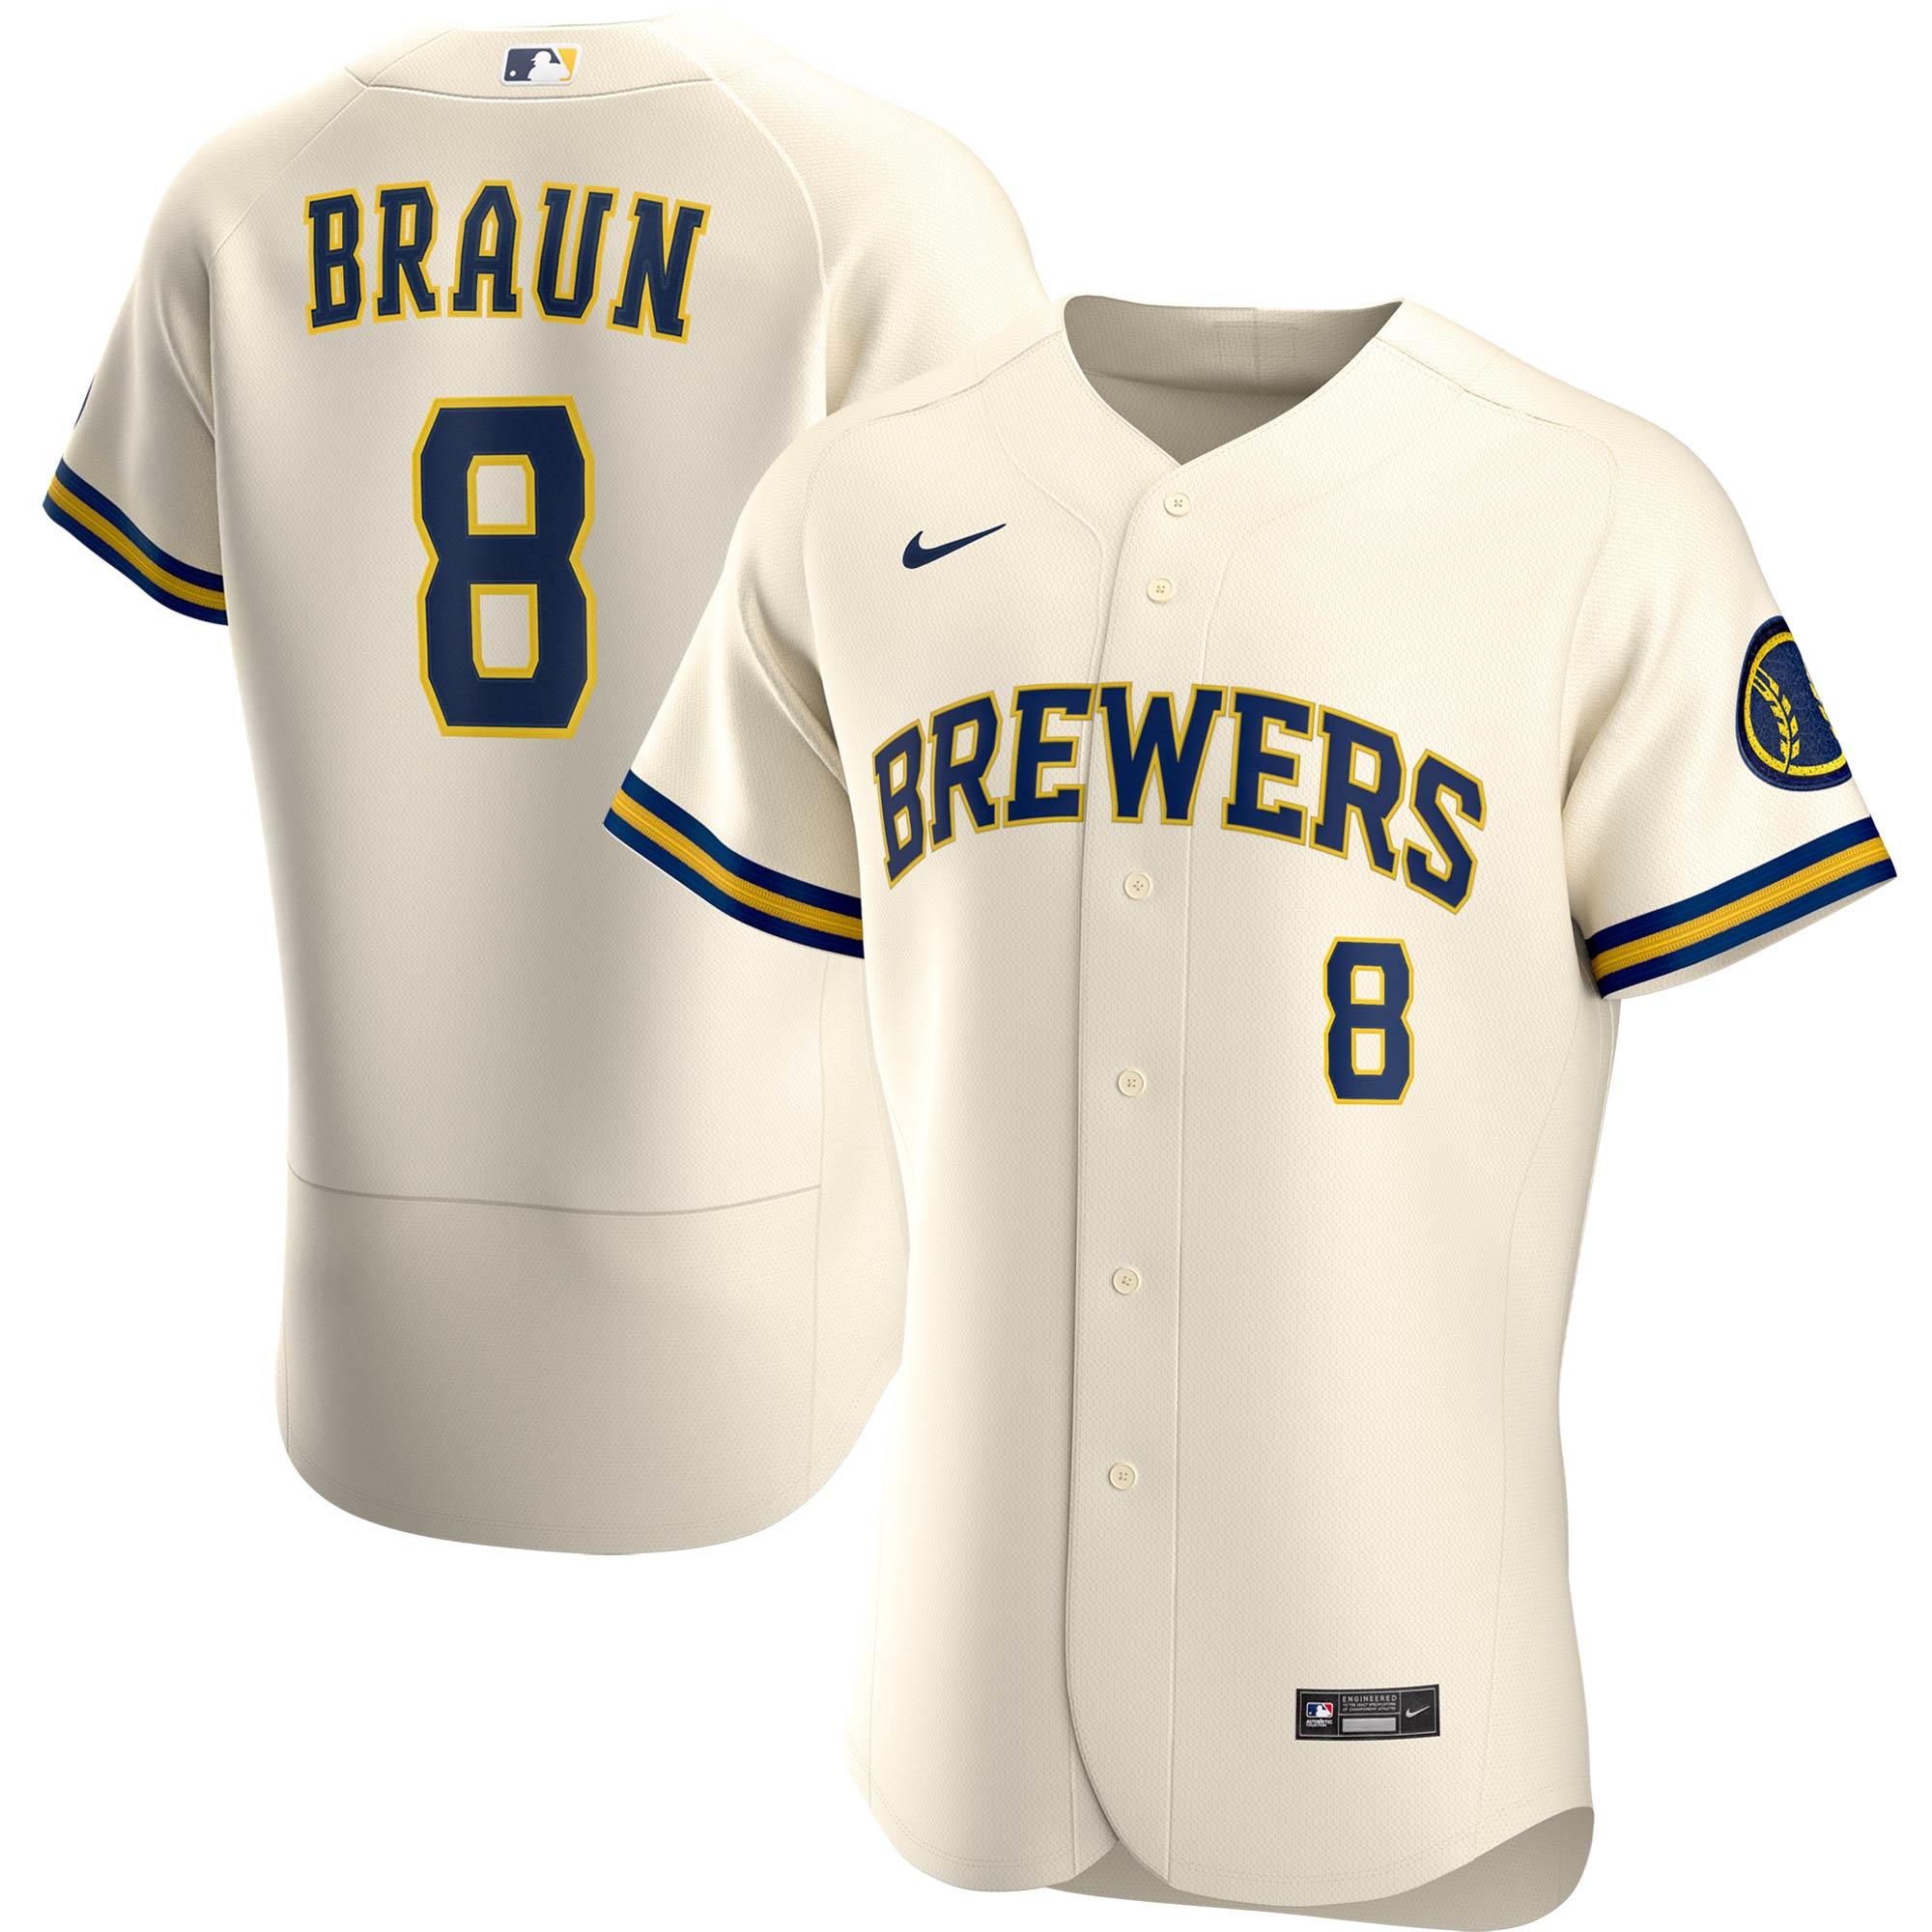 Ryan Braun Milwaukee Brewers Nike Home 2020 Authentic Player Jersey - Cream